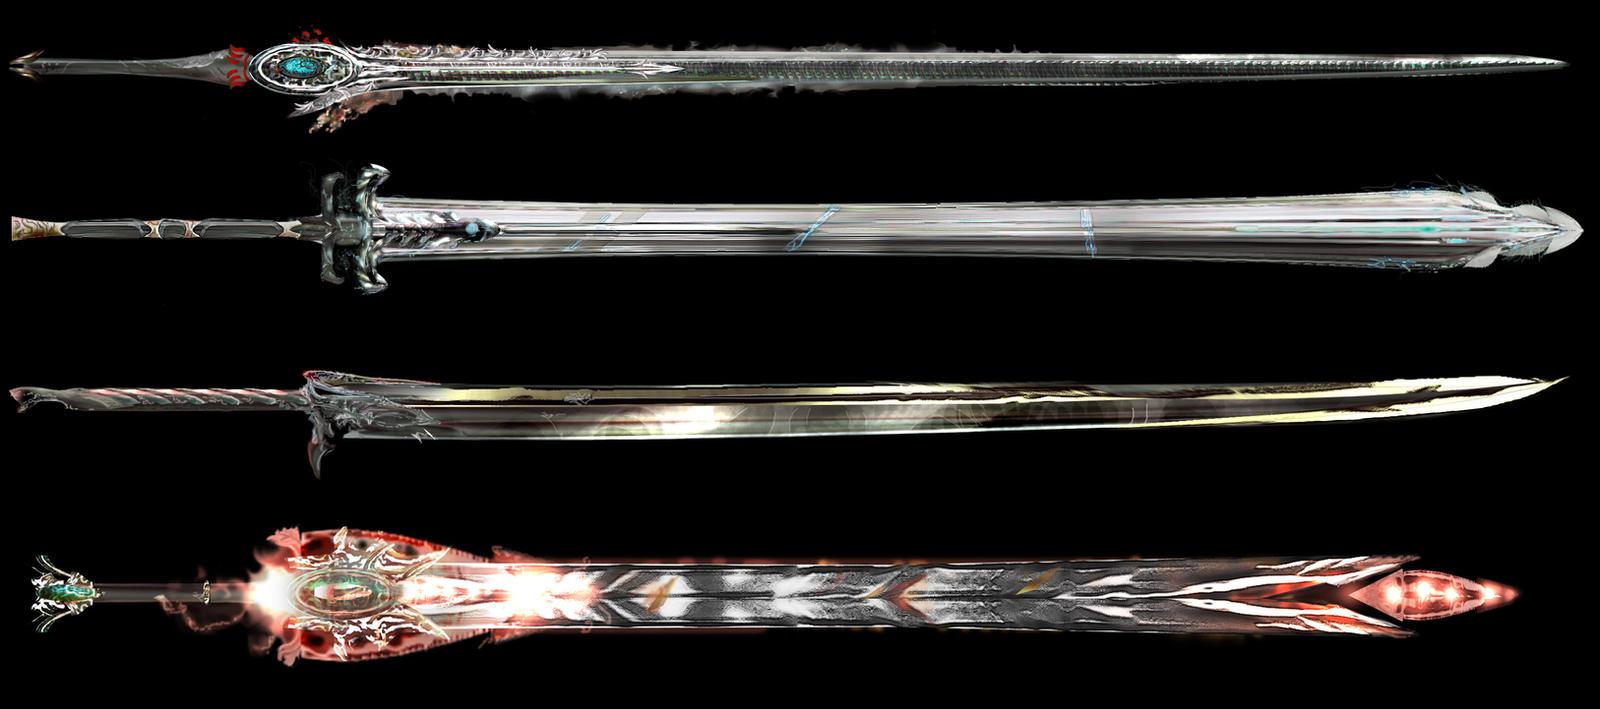 Weaponry 542 by Random223